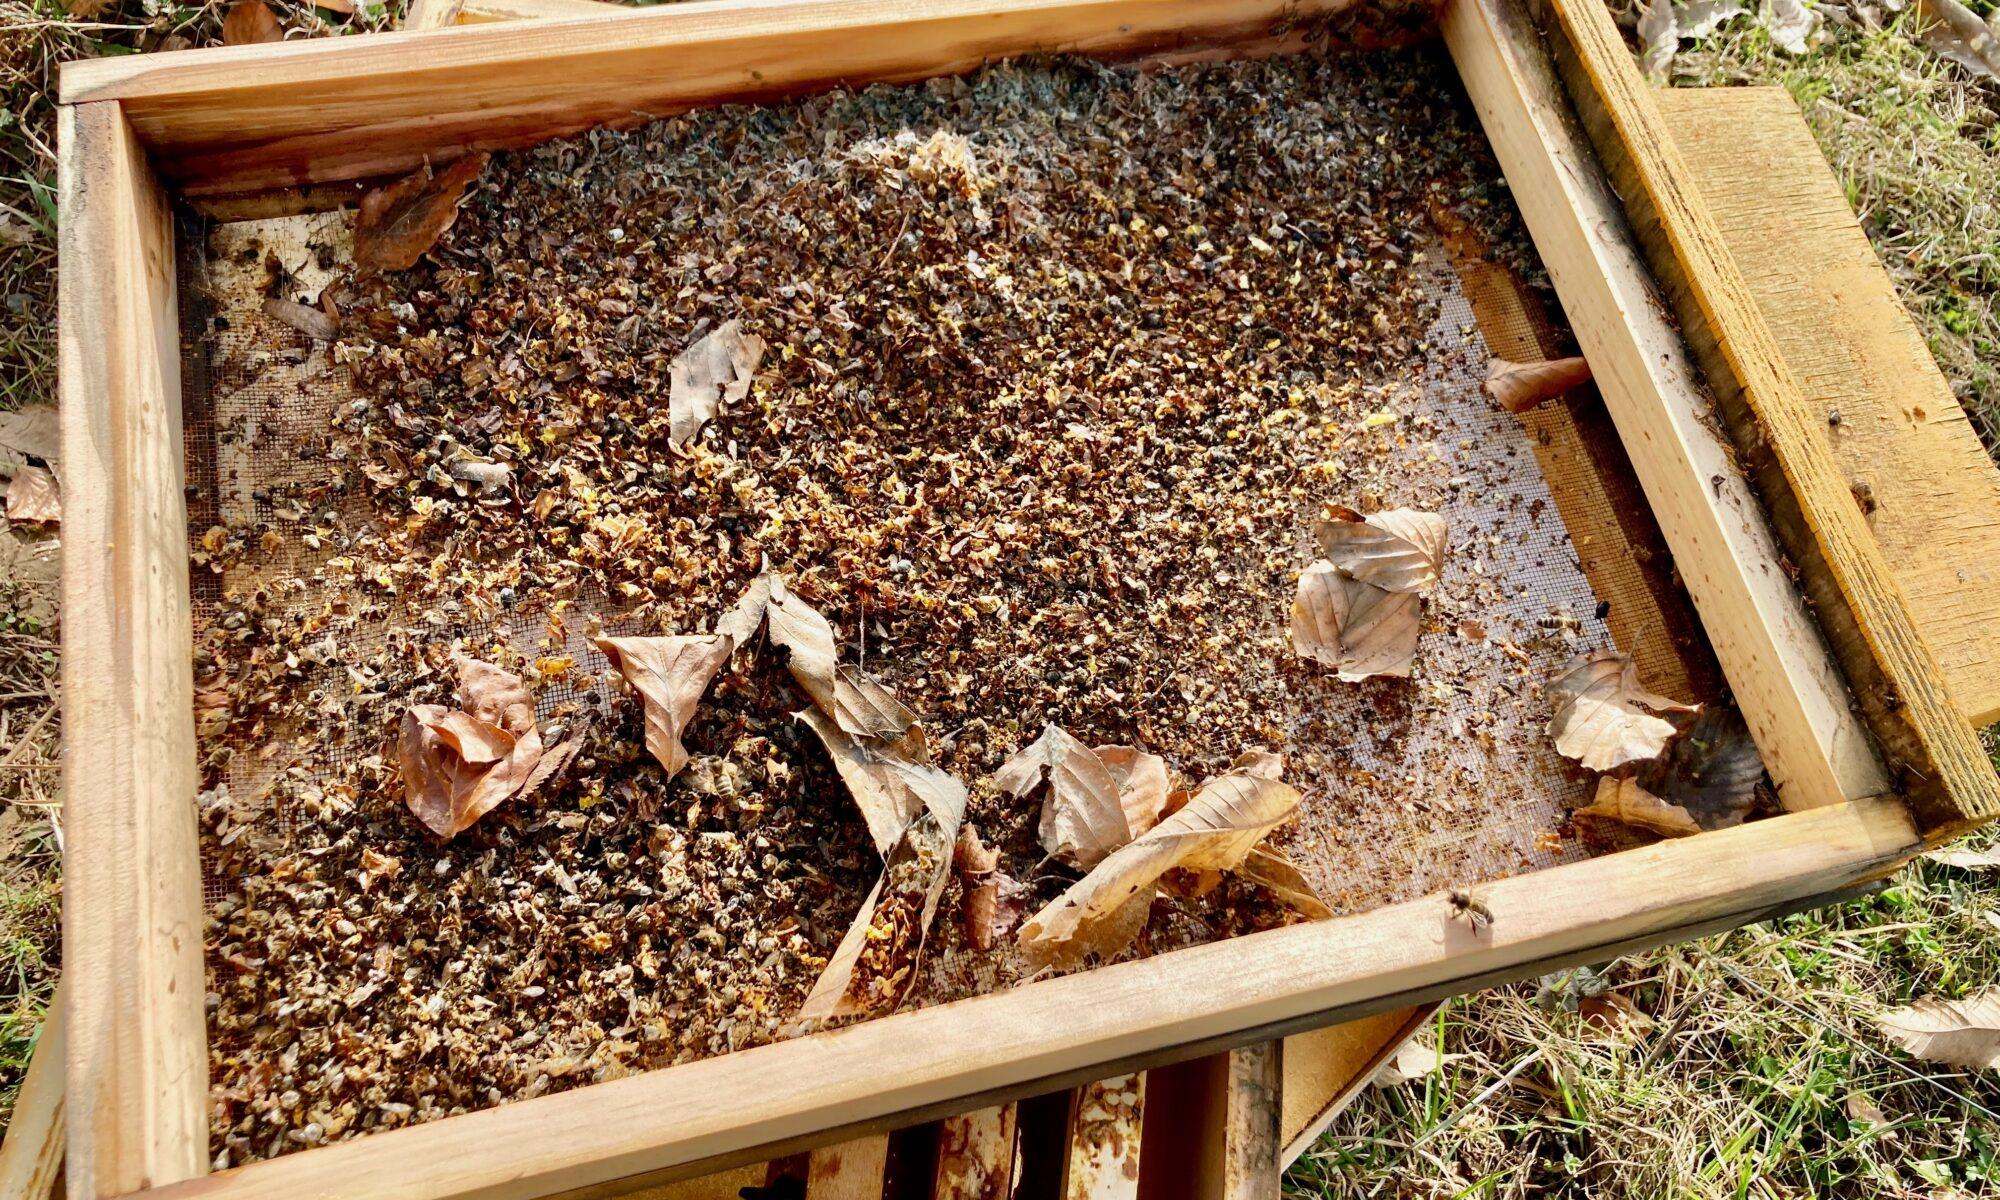 Mäusenest im Bienenstock